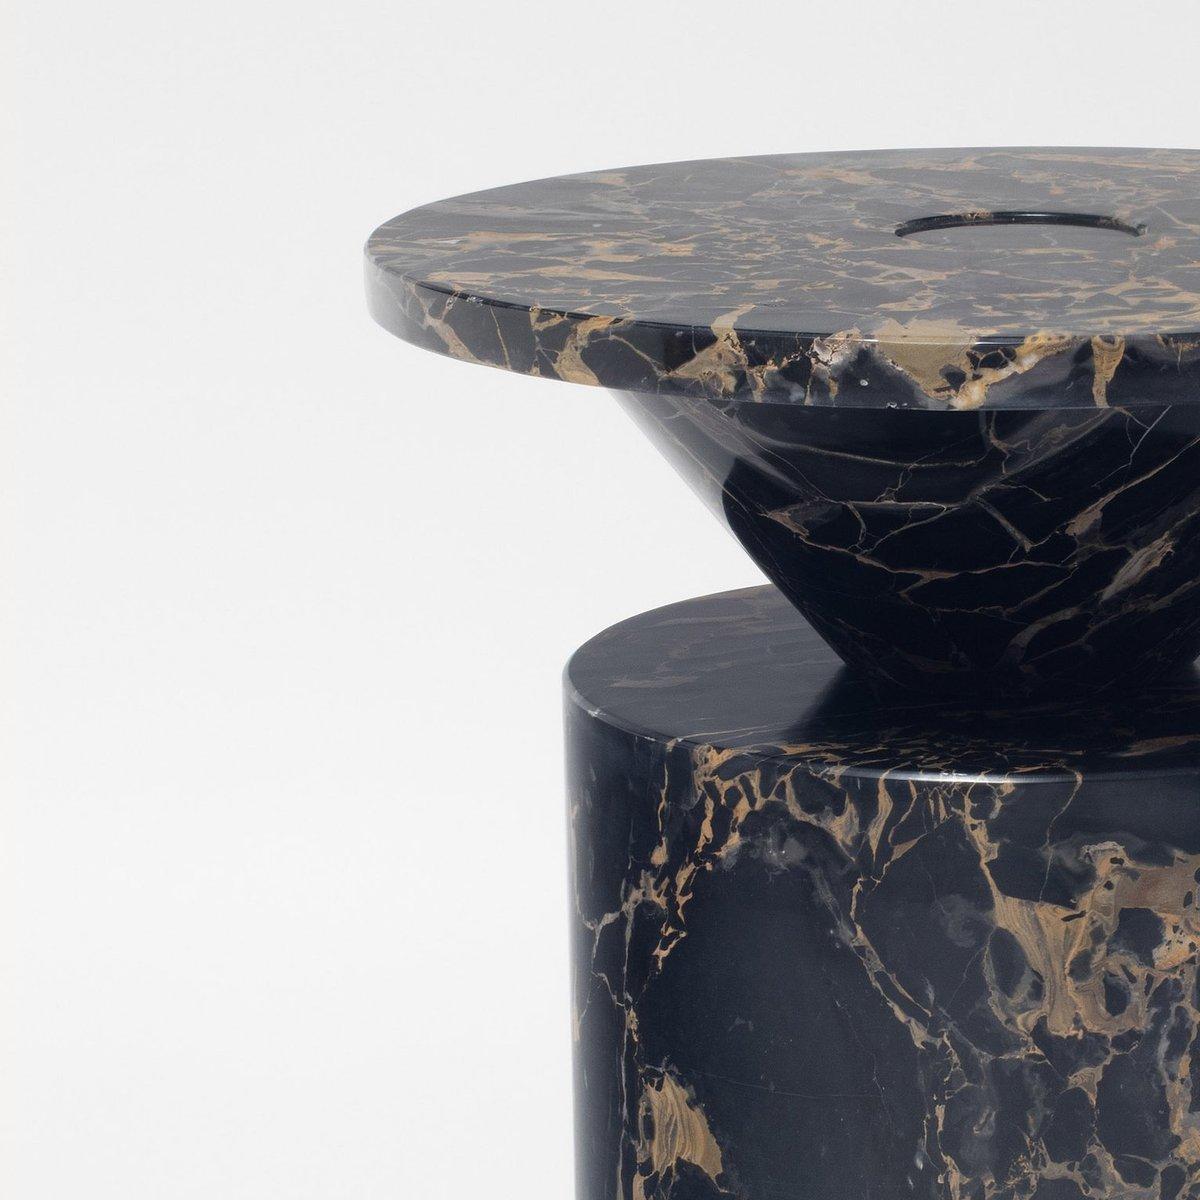 Marble Coffee Table Hk: Totem Coffee Table In Portoro Nero Marble By Karen